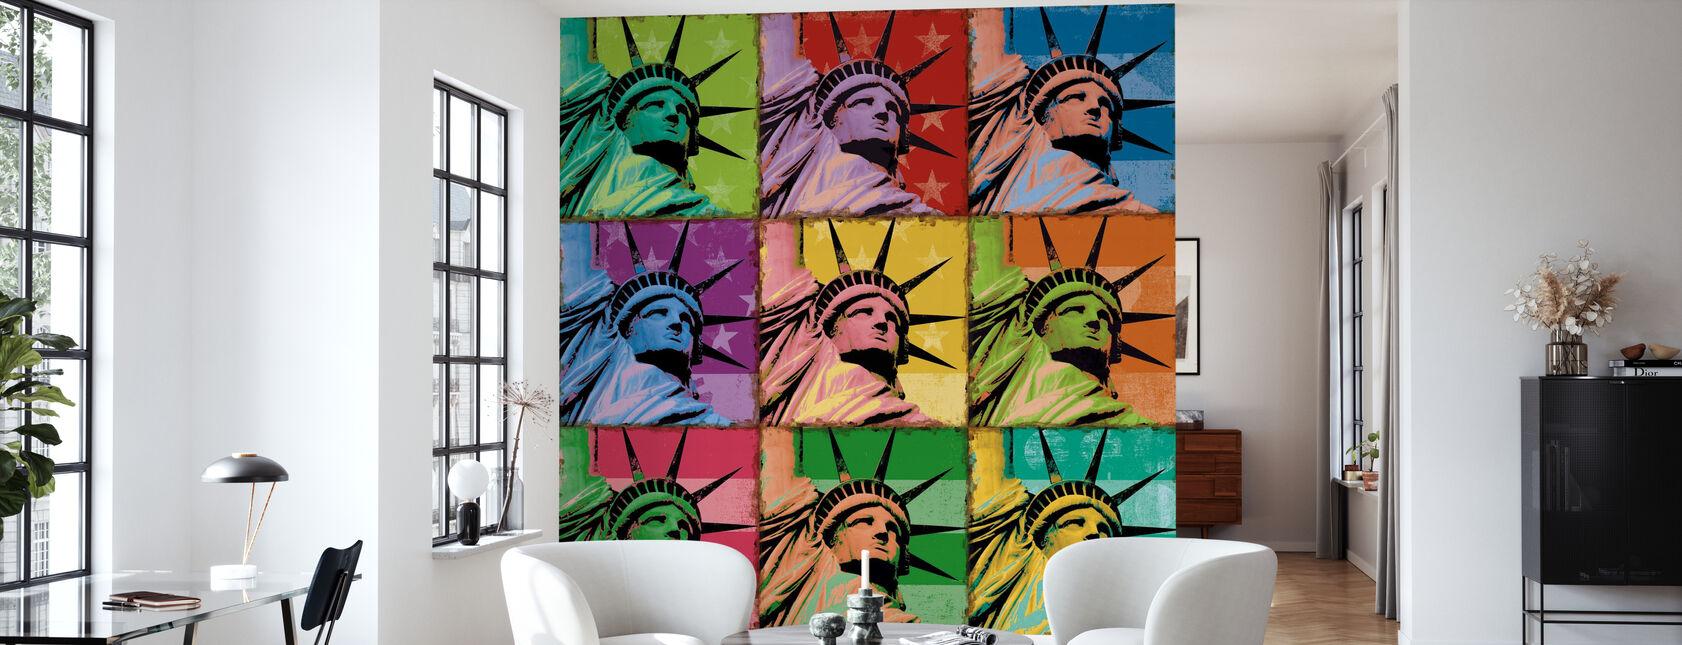 Liberté pop - Papier peint - Salle à manger